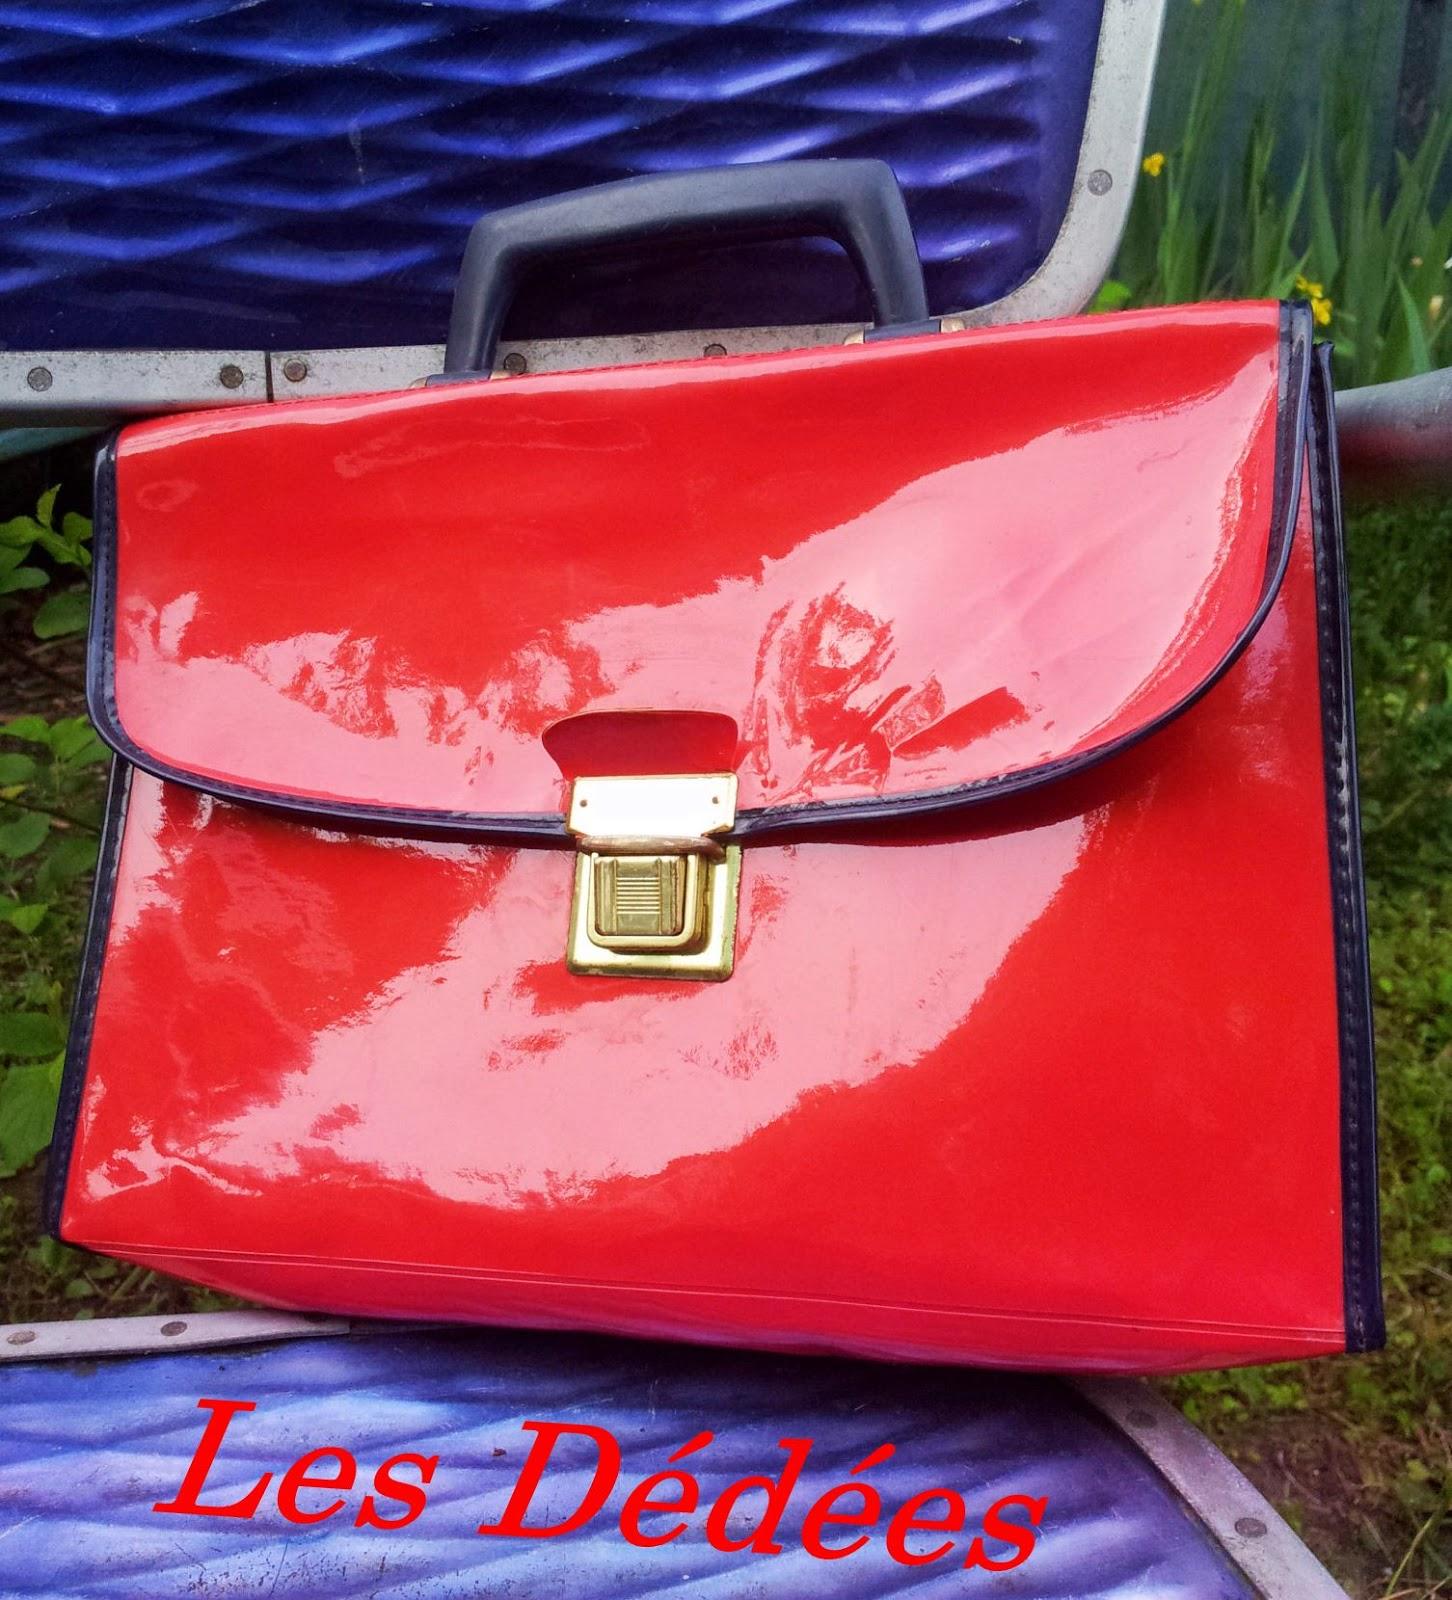 les dedees vintage recup creations adorable mini cartable vintage rouge vernis 70 39 s by anne. Black Bedroom Furniture Sets. Home Design Ideas